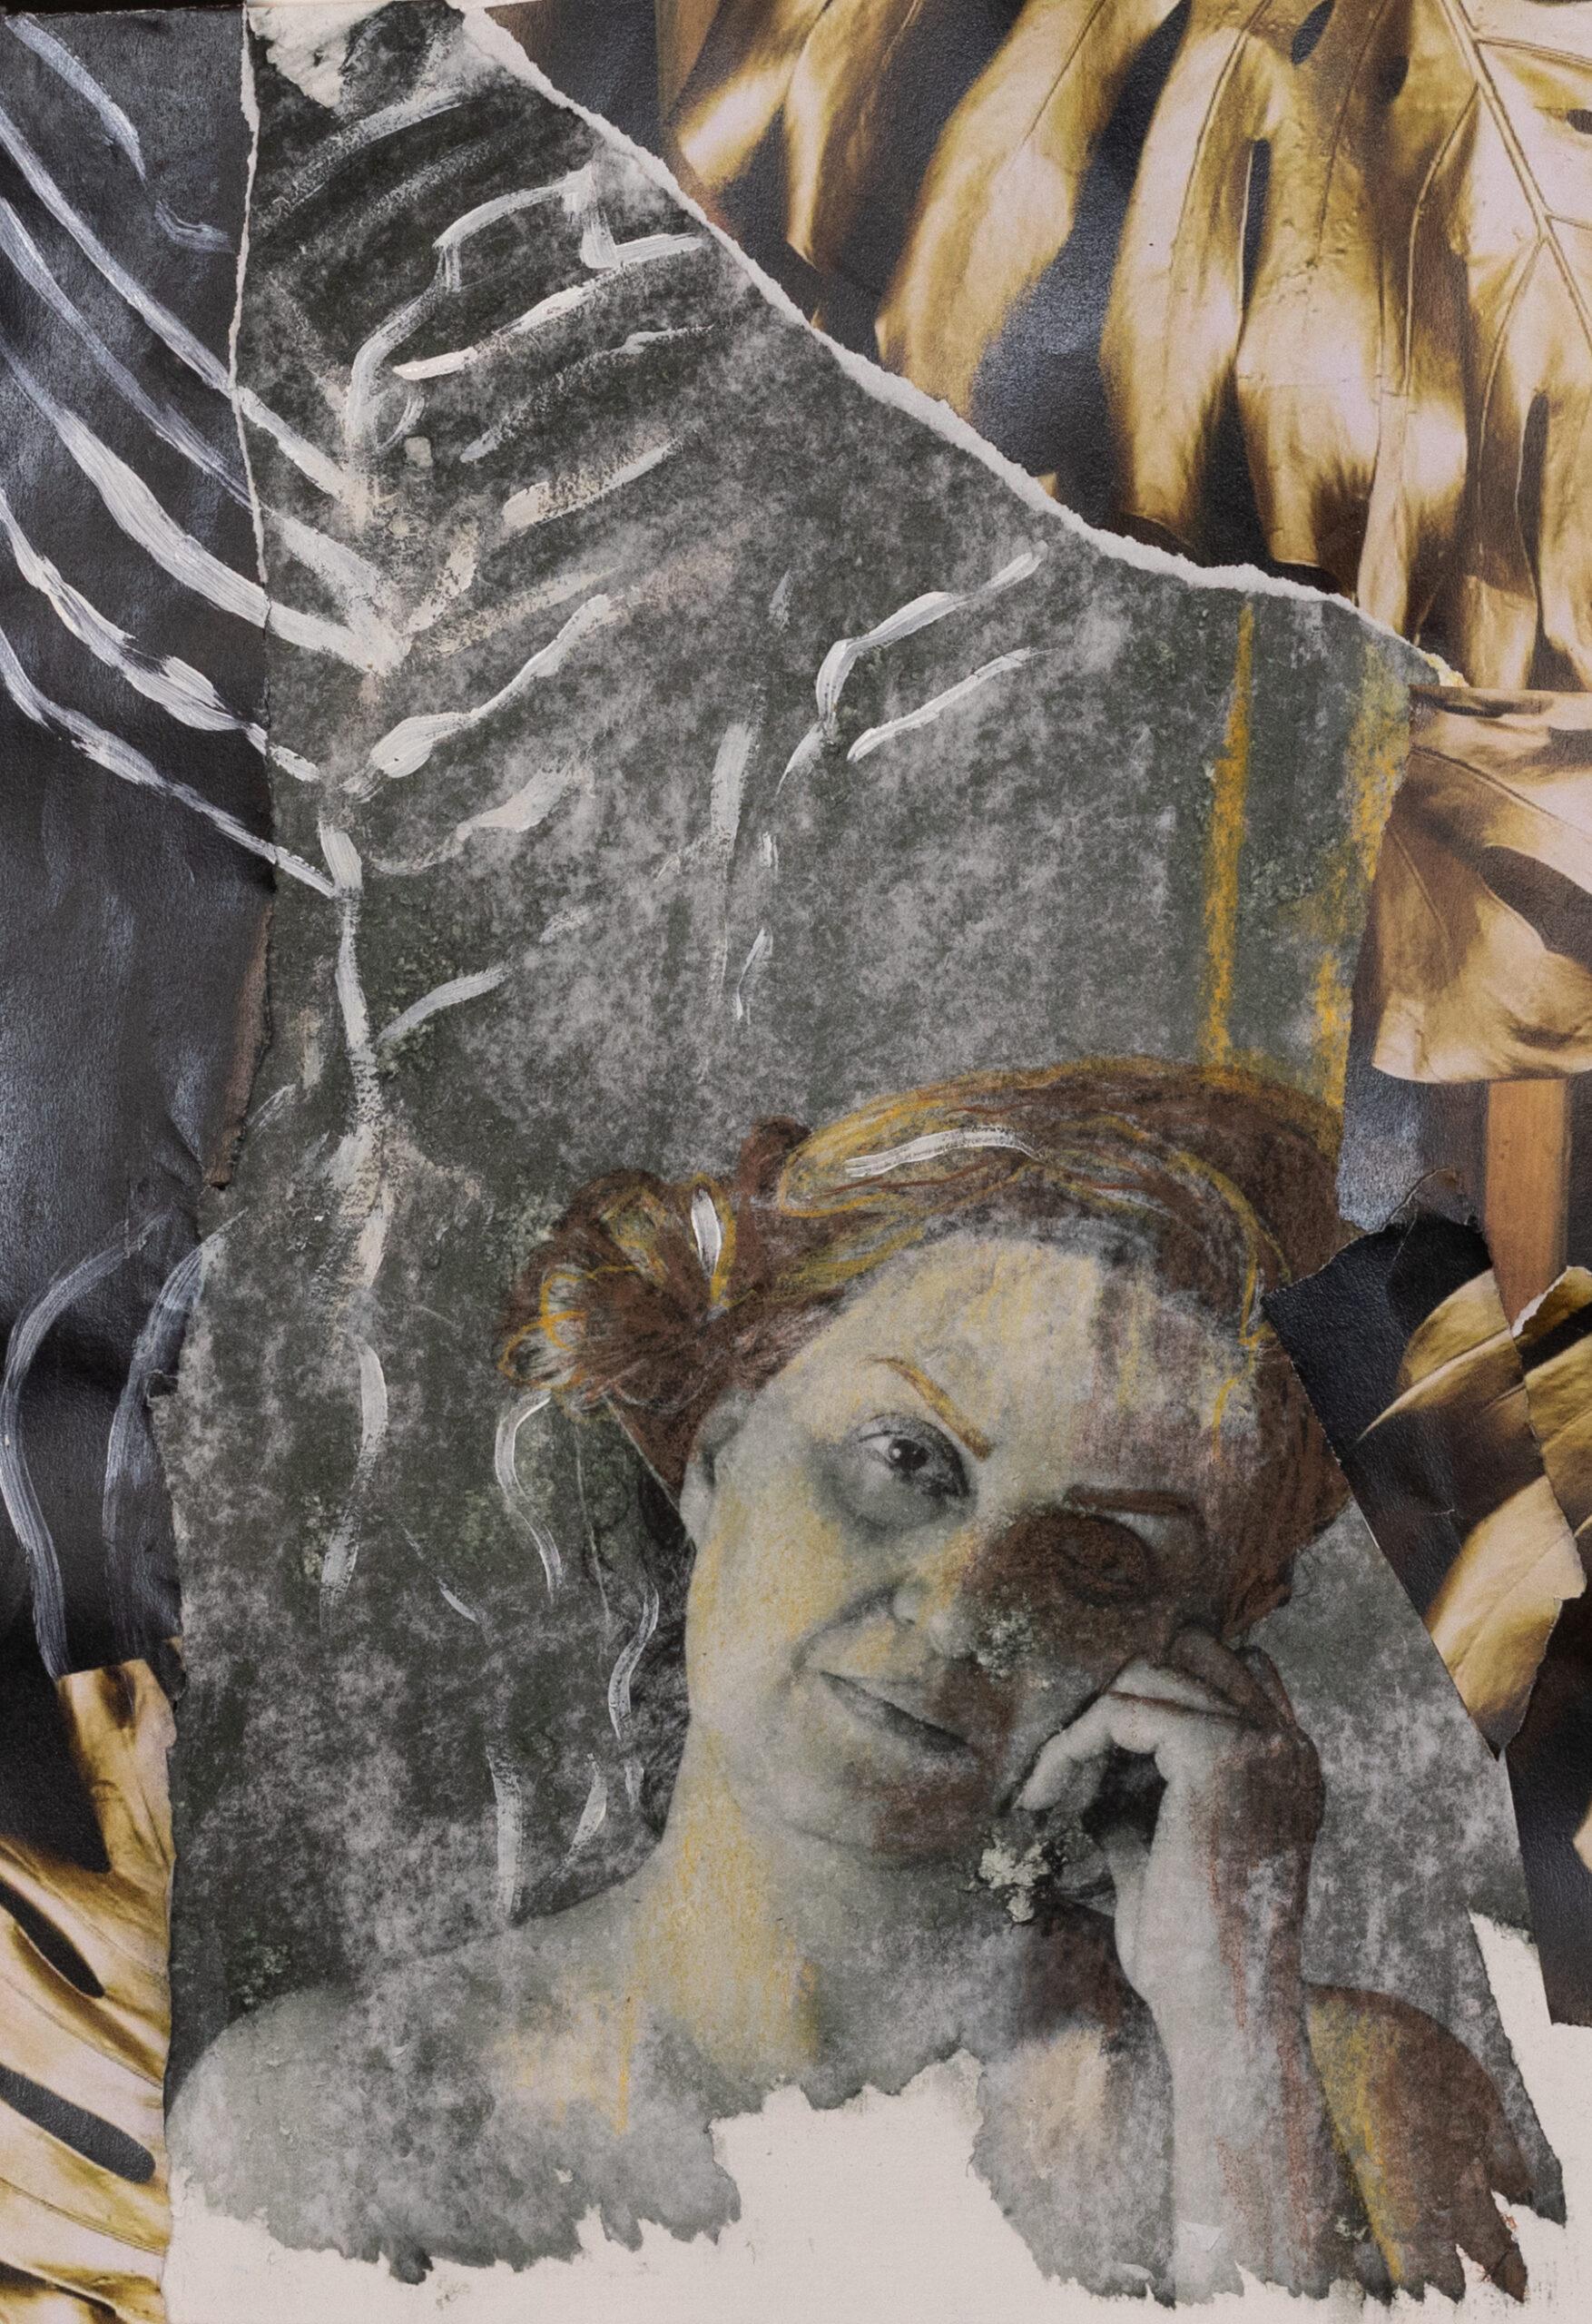 Artwork by Armita Aghaseyedjafarimojarrad | Portrait2020 | MenhaArt